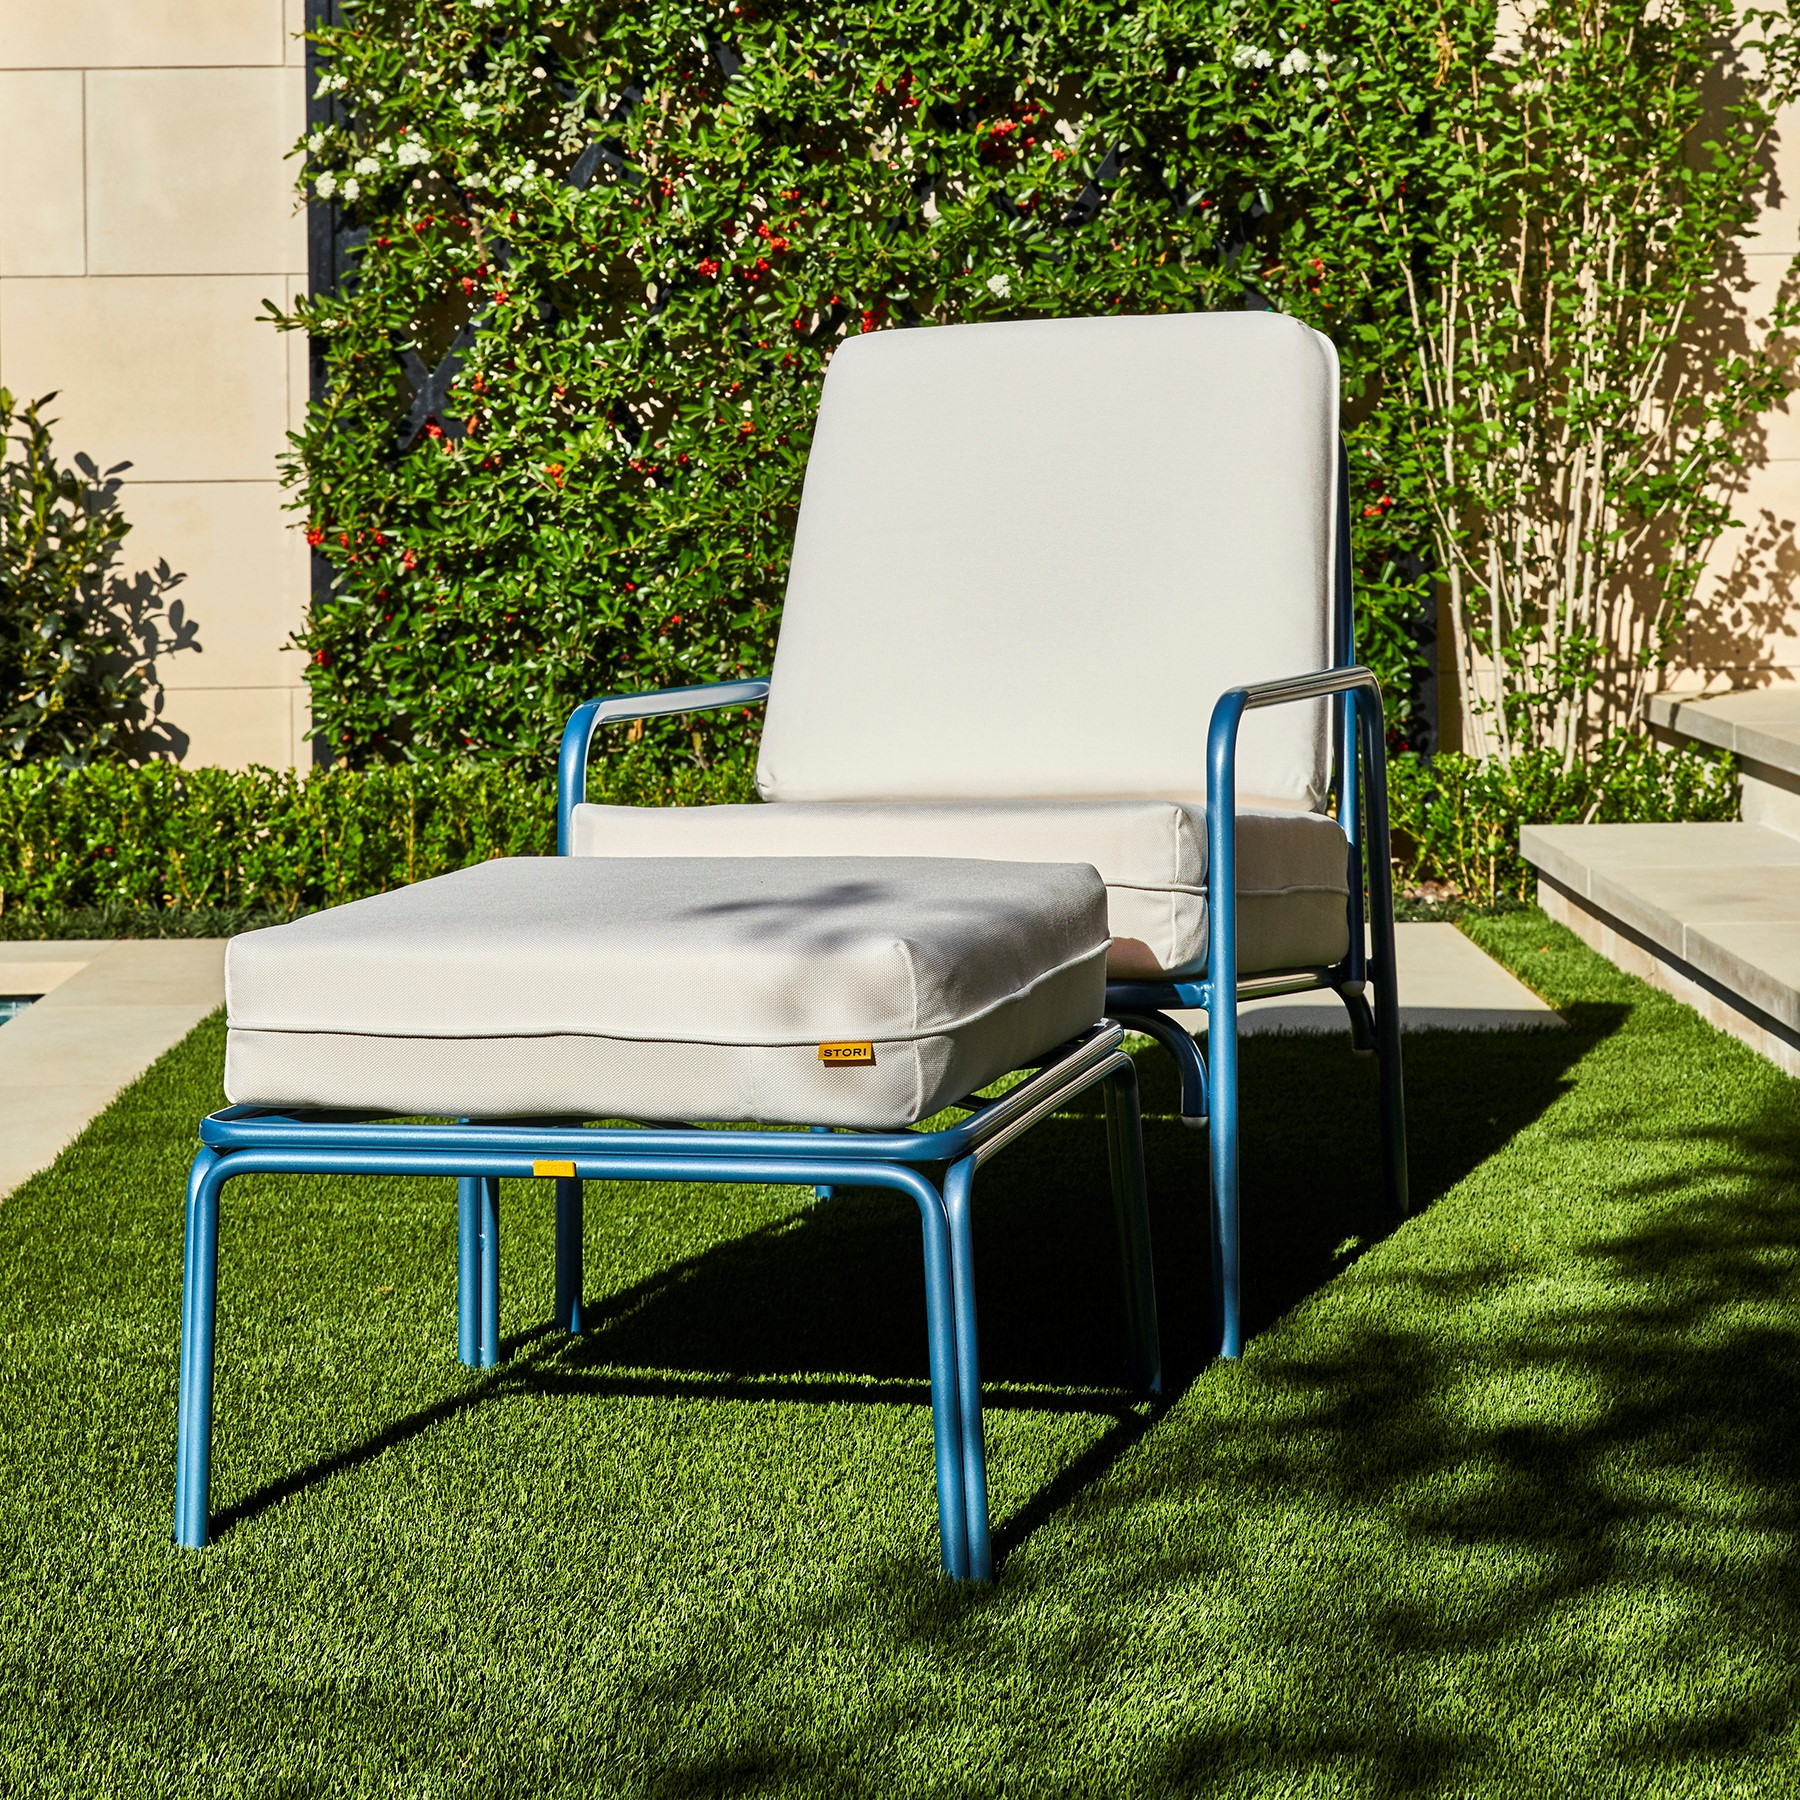 Sunbrella outdoor fabric on Stori Modern Fairy Tale patio furniture